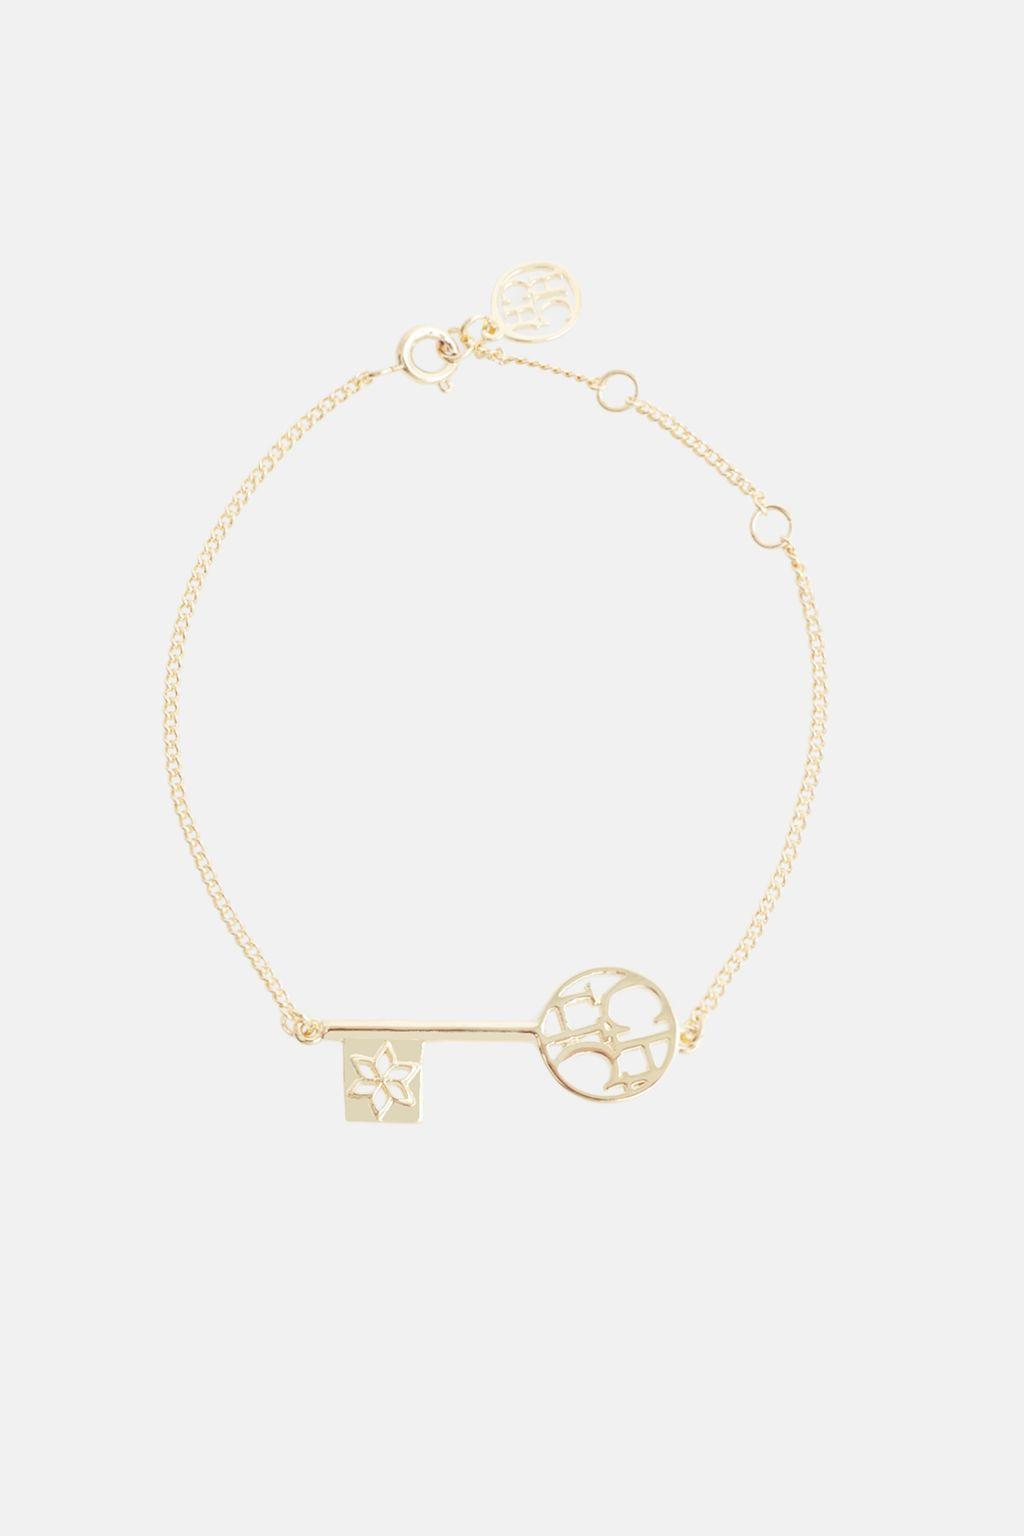 Las Llaves bracelet